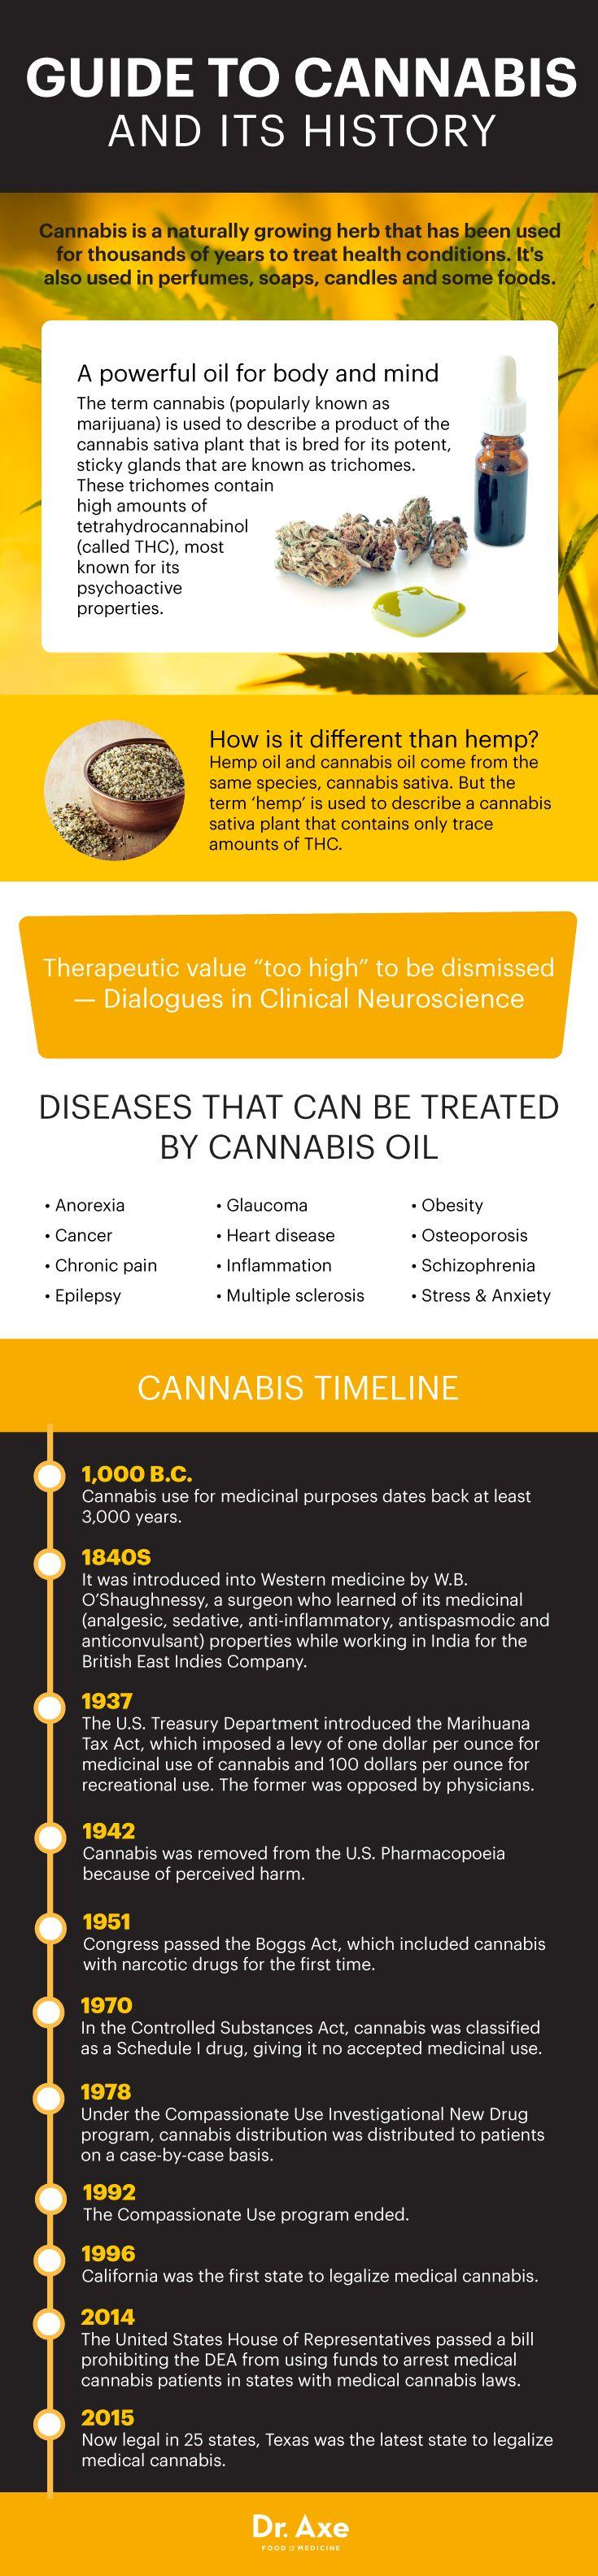 Guide to cannabis oil - Dr. Axe http://www.draxe.com #health #holistic #natural